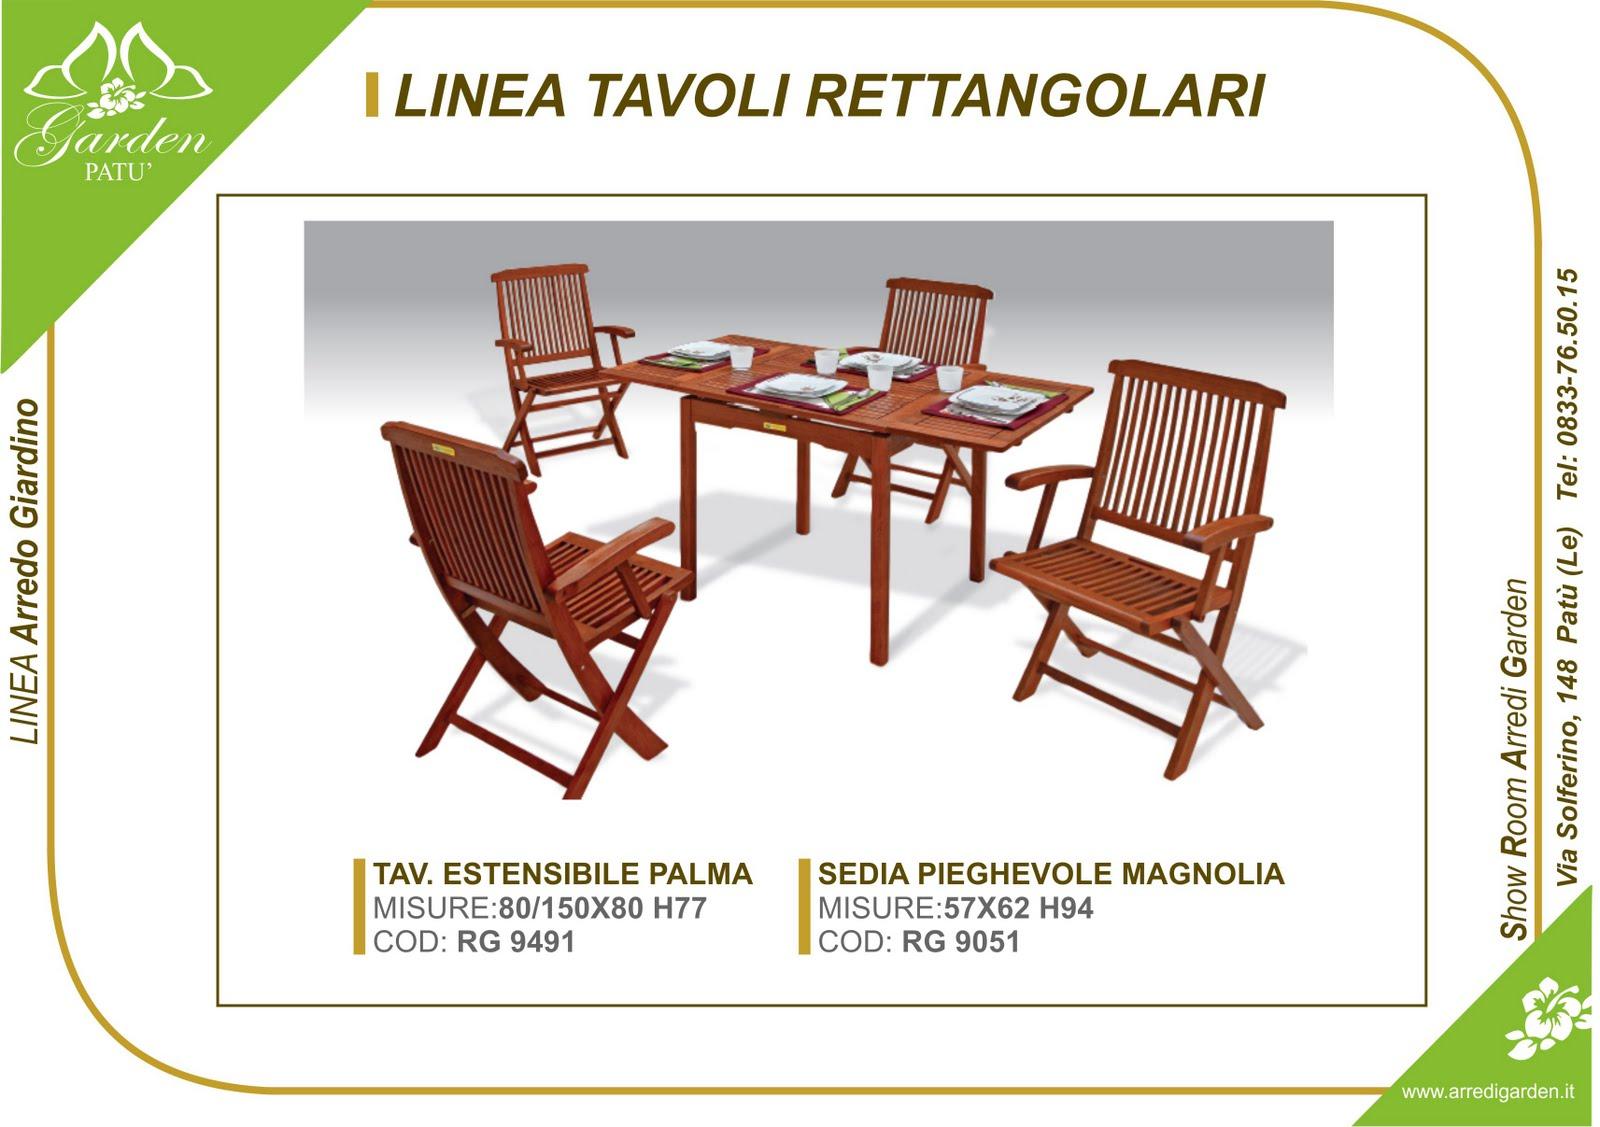 Arredo giardino italia arredo giardino pat tavoli in for Italia arredo